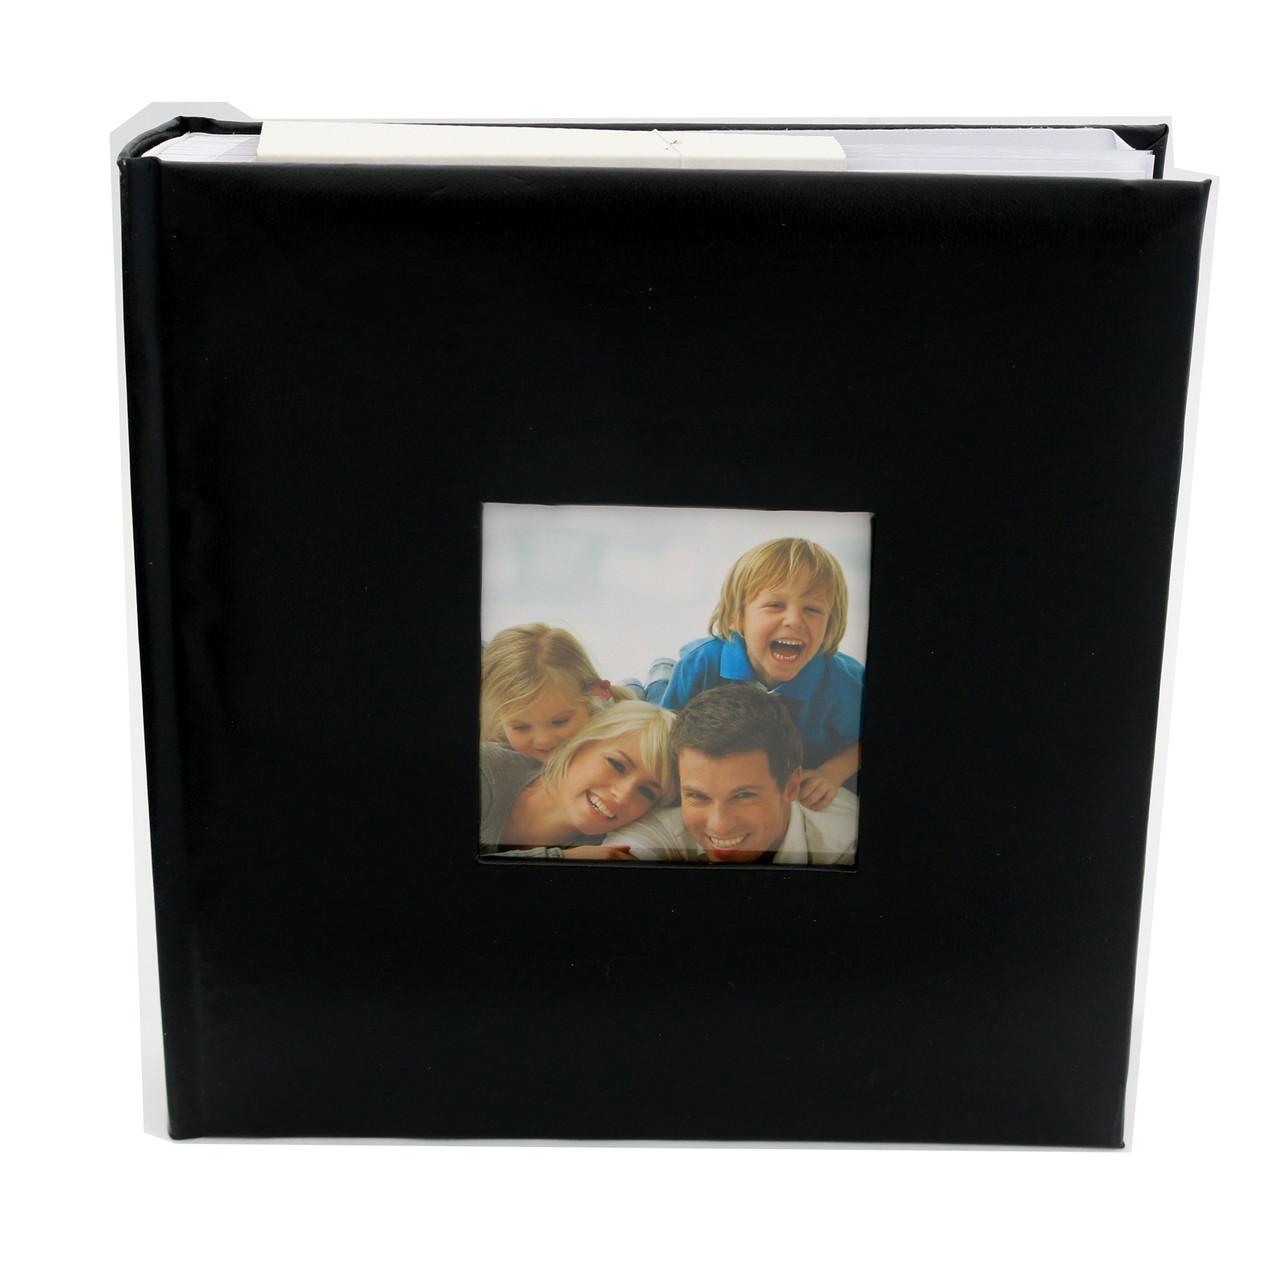 Quality Photo Albums: 200 Photo Slip In Archival Quality Photo Album Plain Black